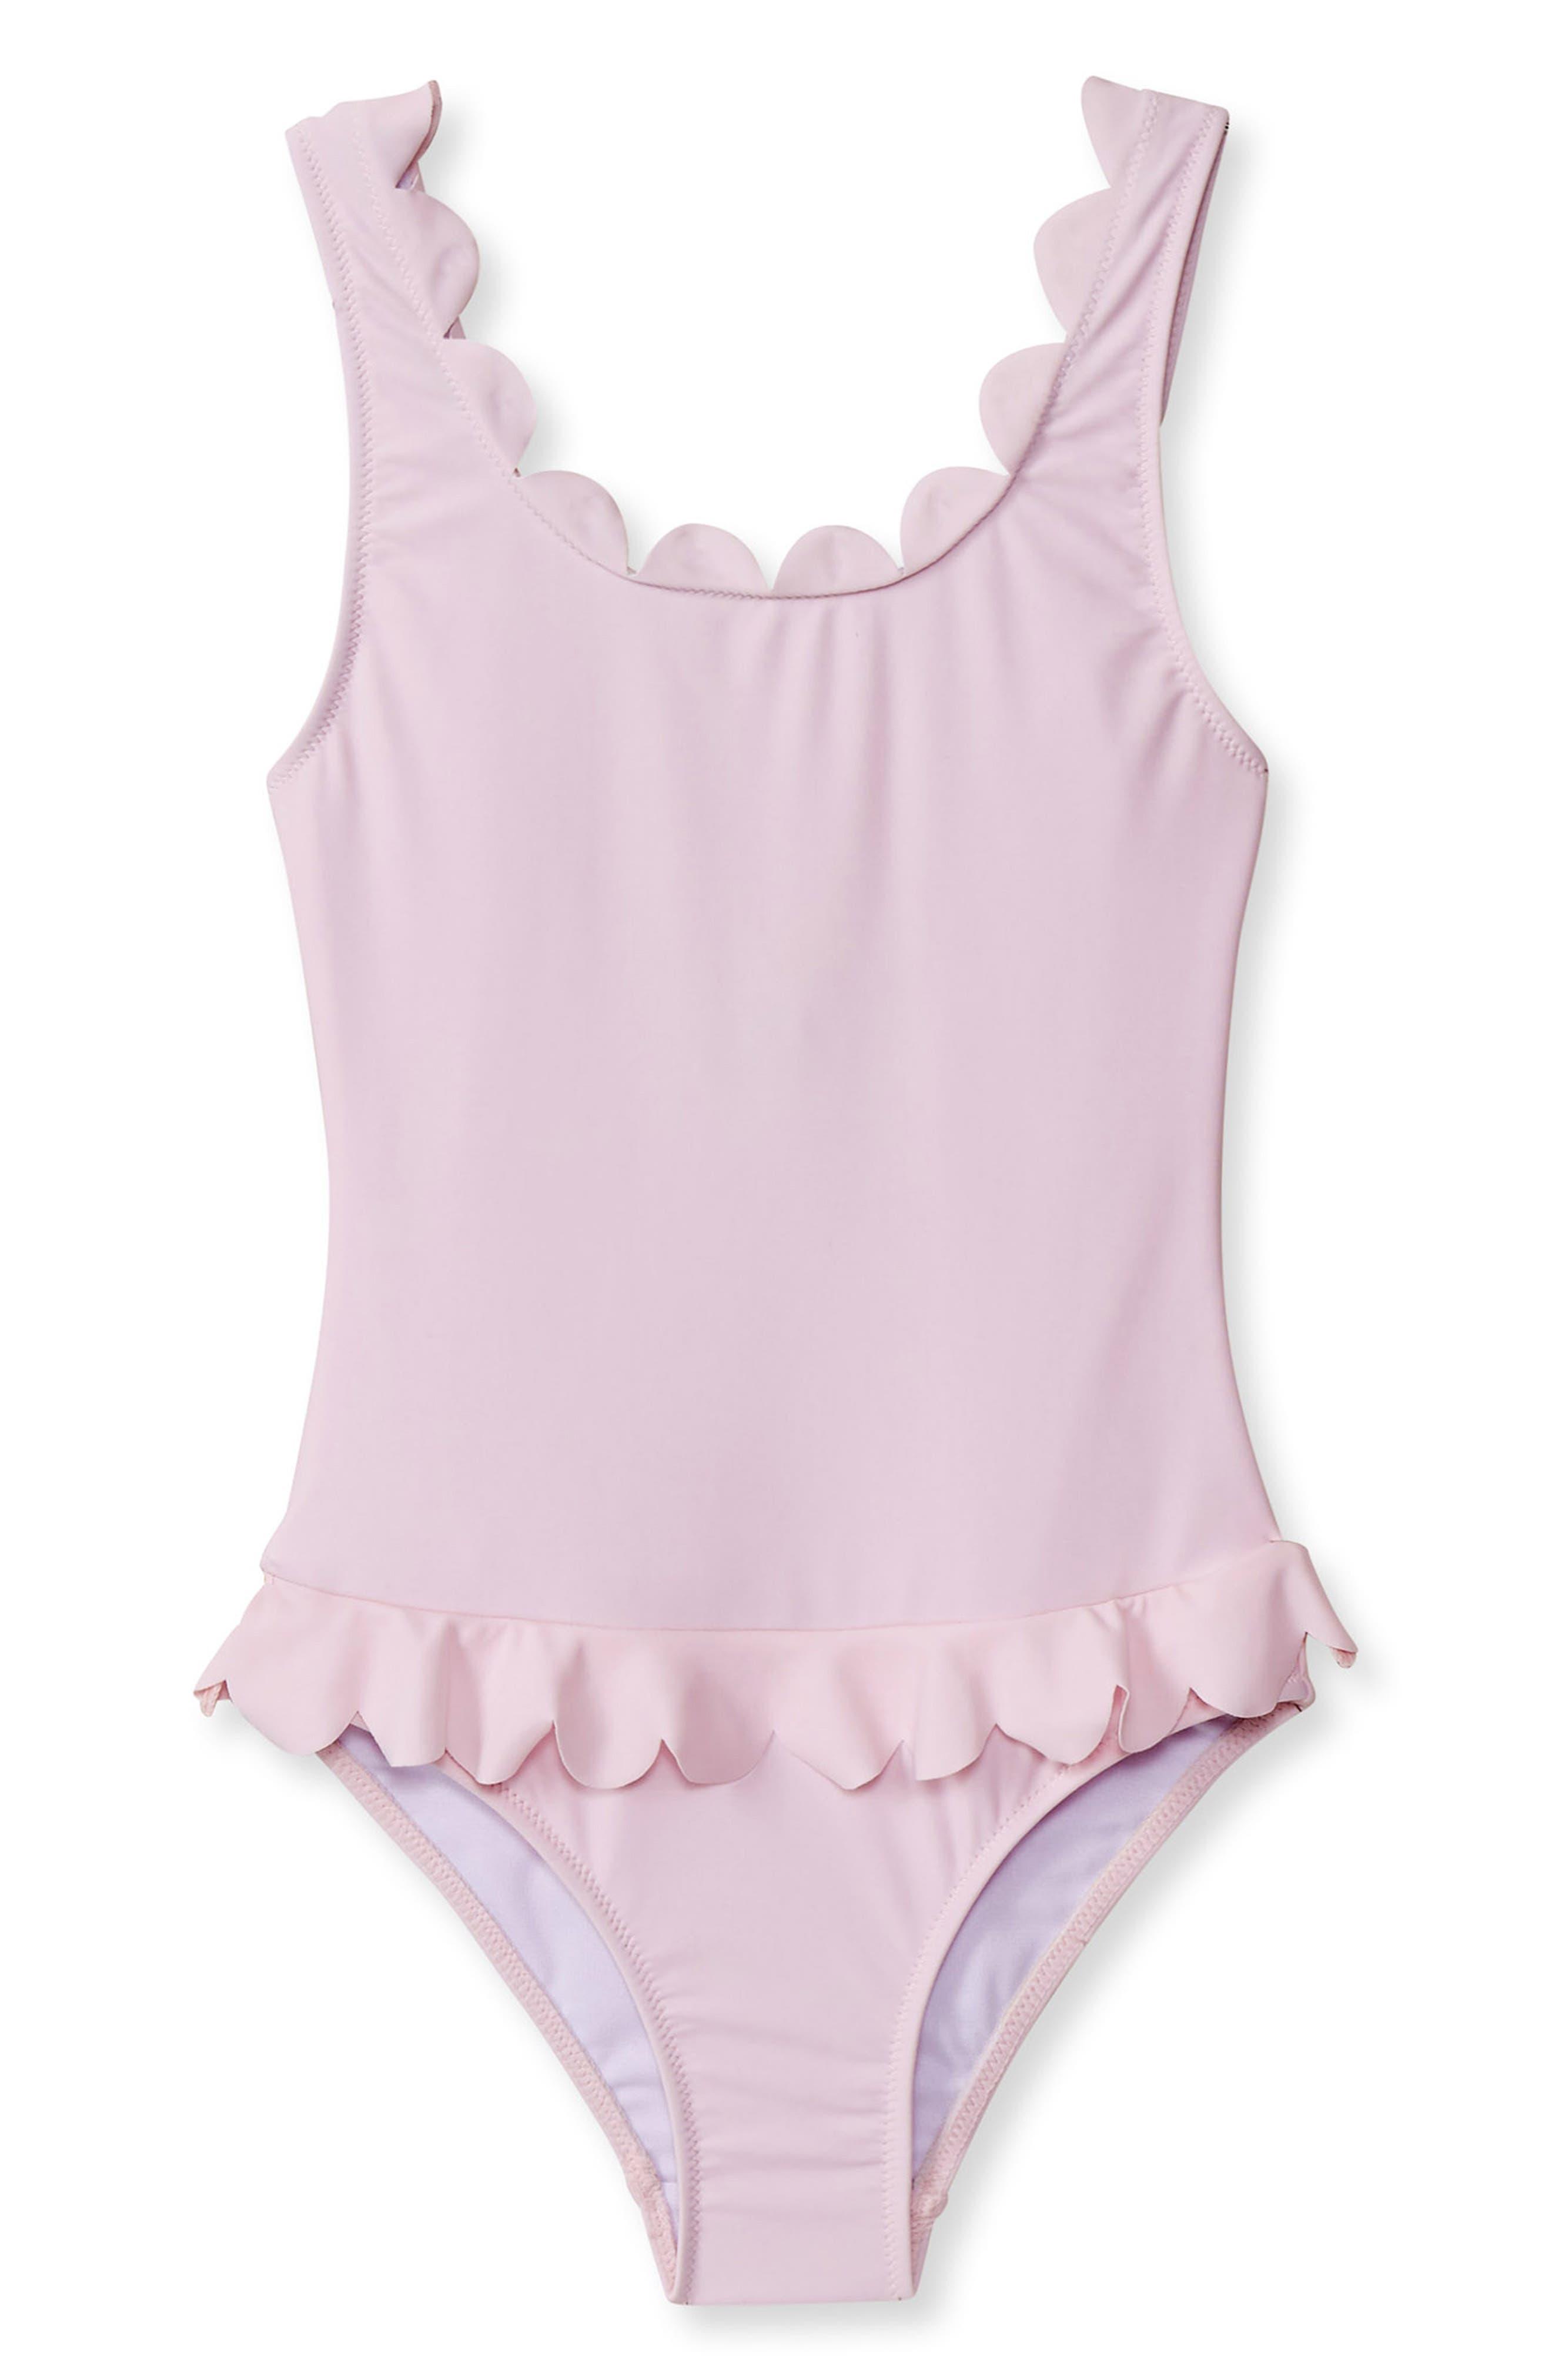 Scallop Trim One-Piece Swimsuit,                             Main thumbnail 1, color,                             PINK